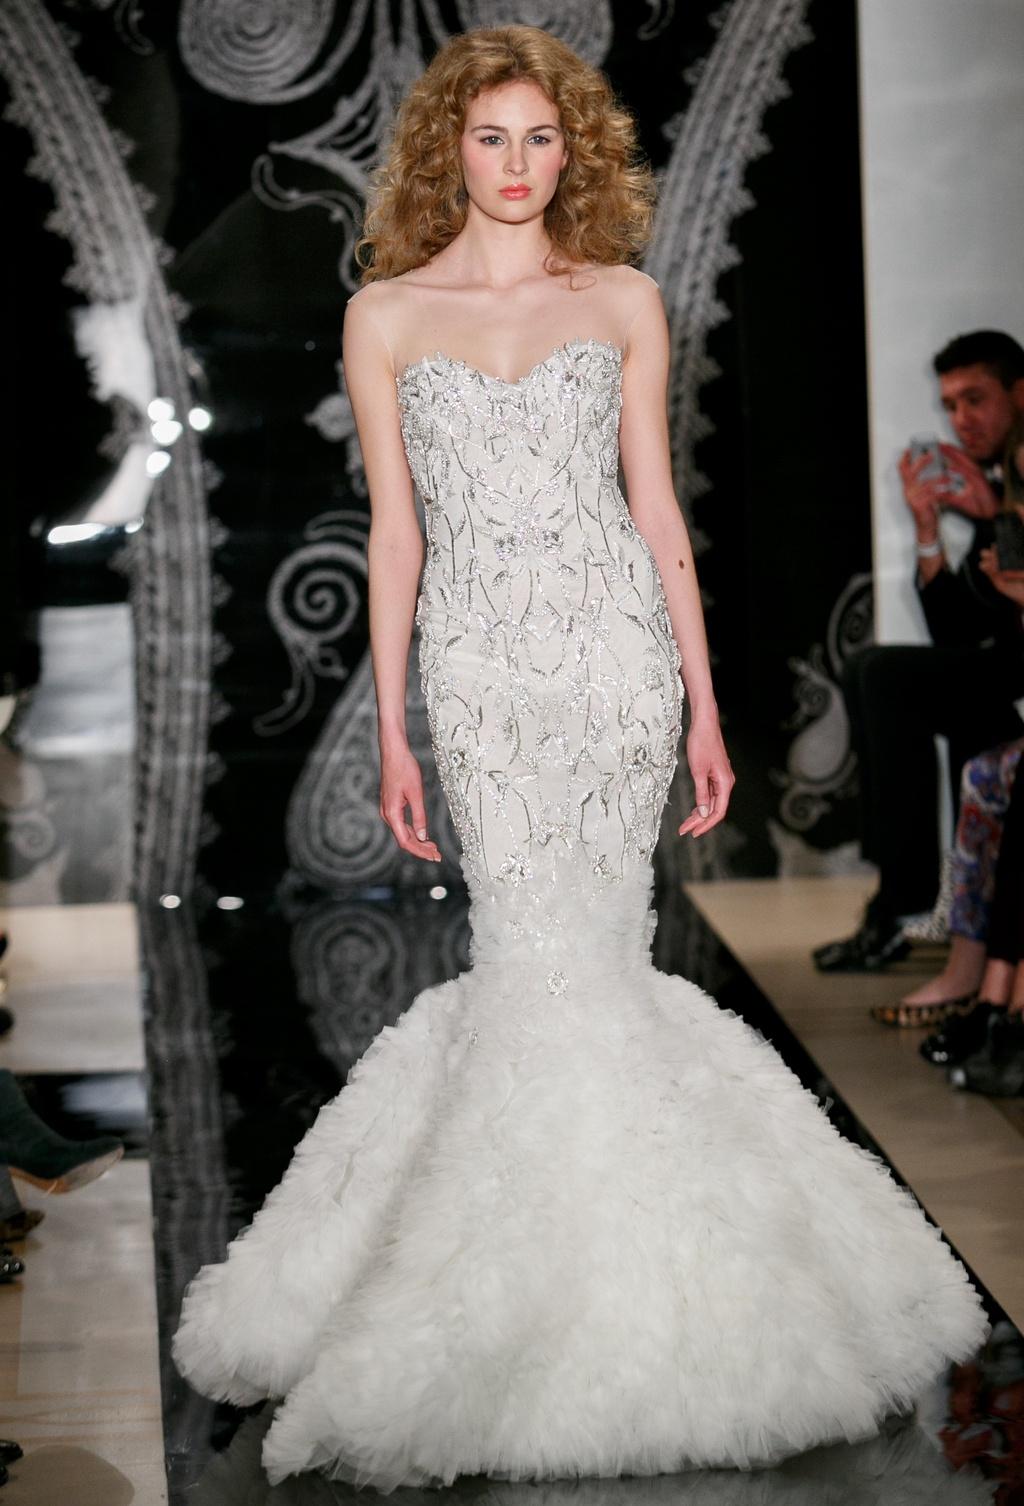 Reem-acra-wedding-dress-spring-2014-bridal-fabiola.full